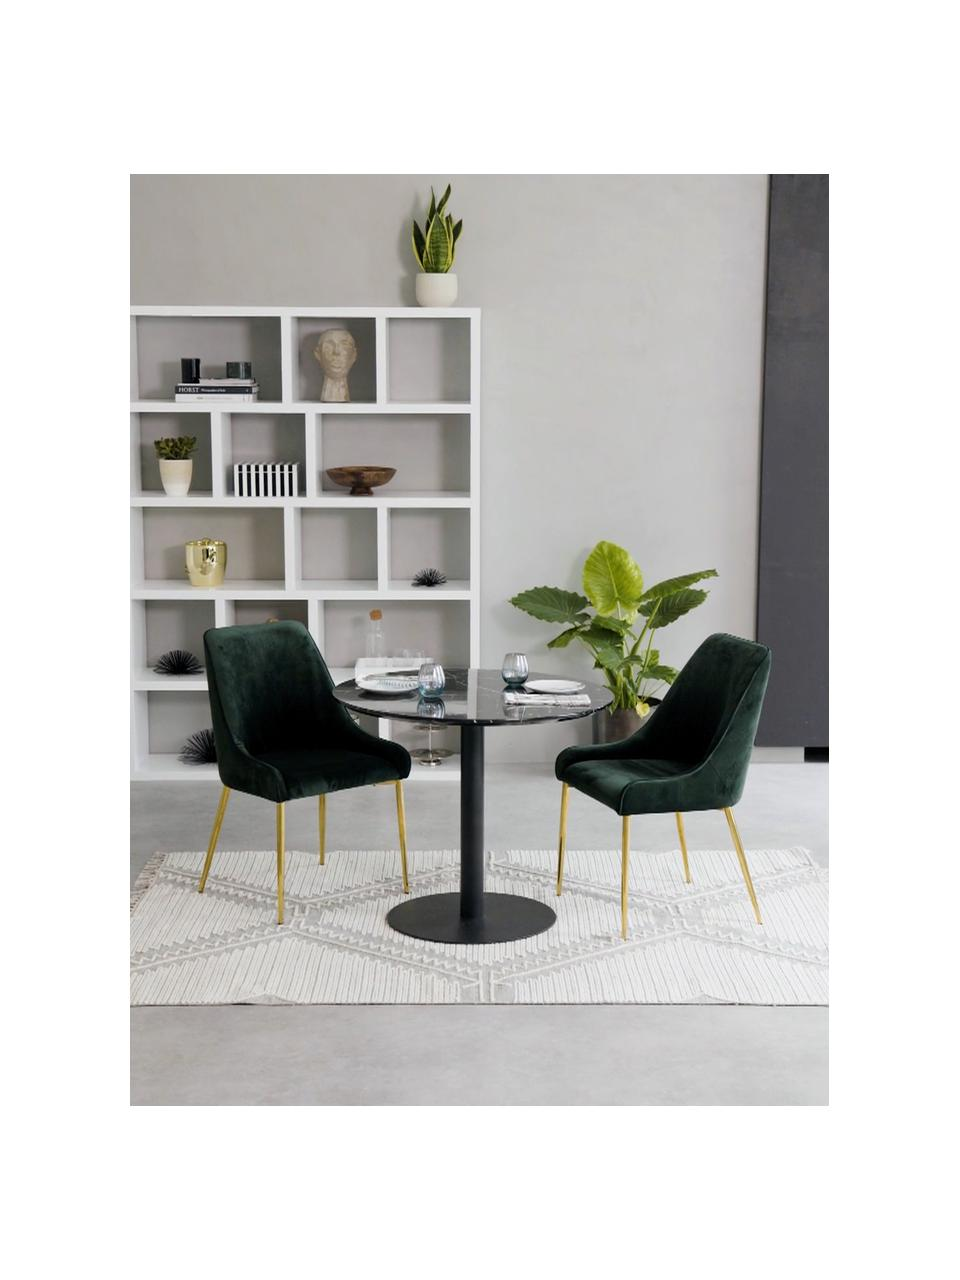 Fluwelen stoel Ava in donkergroen, Bekleding: fluweel (100% polyester), Poten: gegalvaniseerd metaal, Fluweel donkergroen, B 55 x D 60 cm